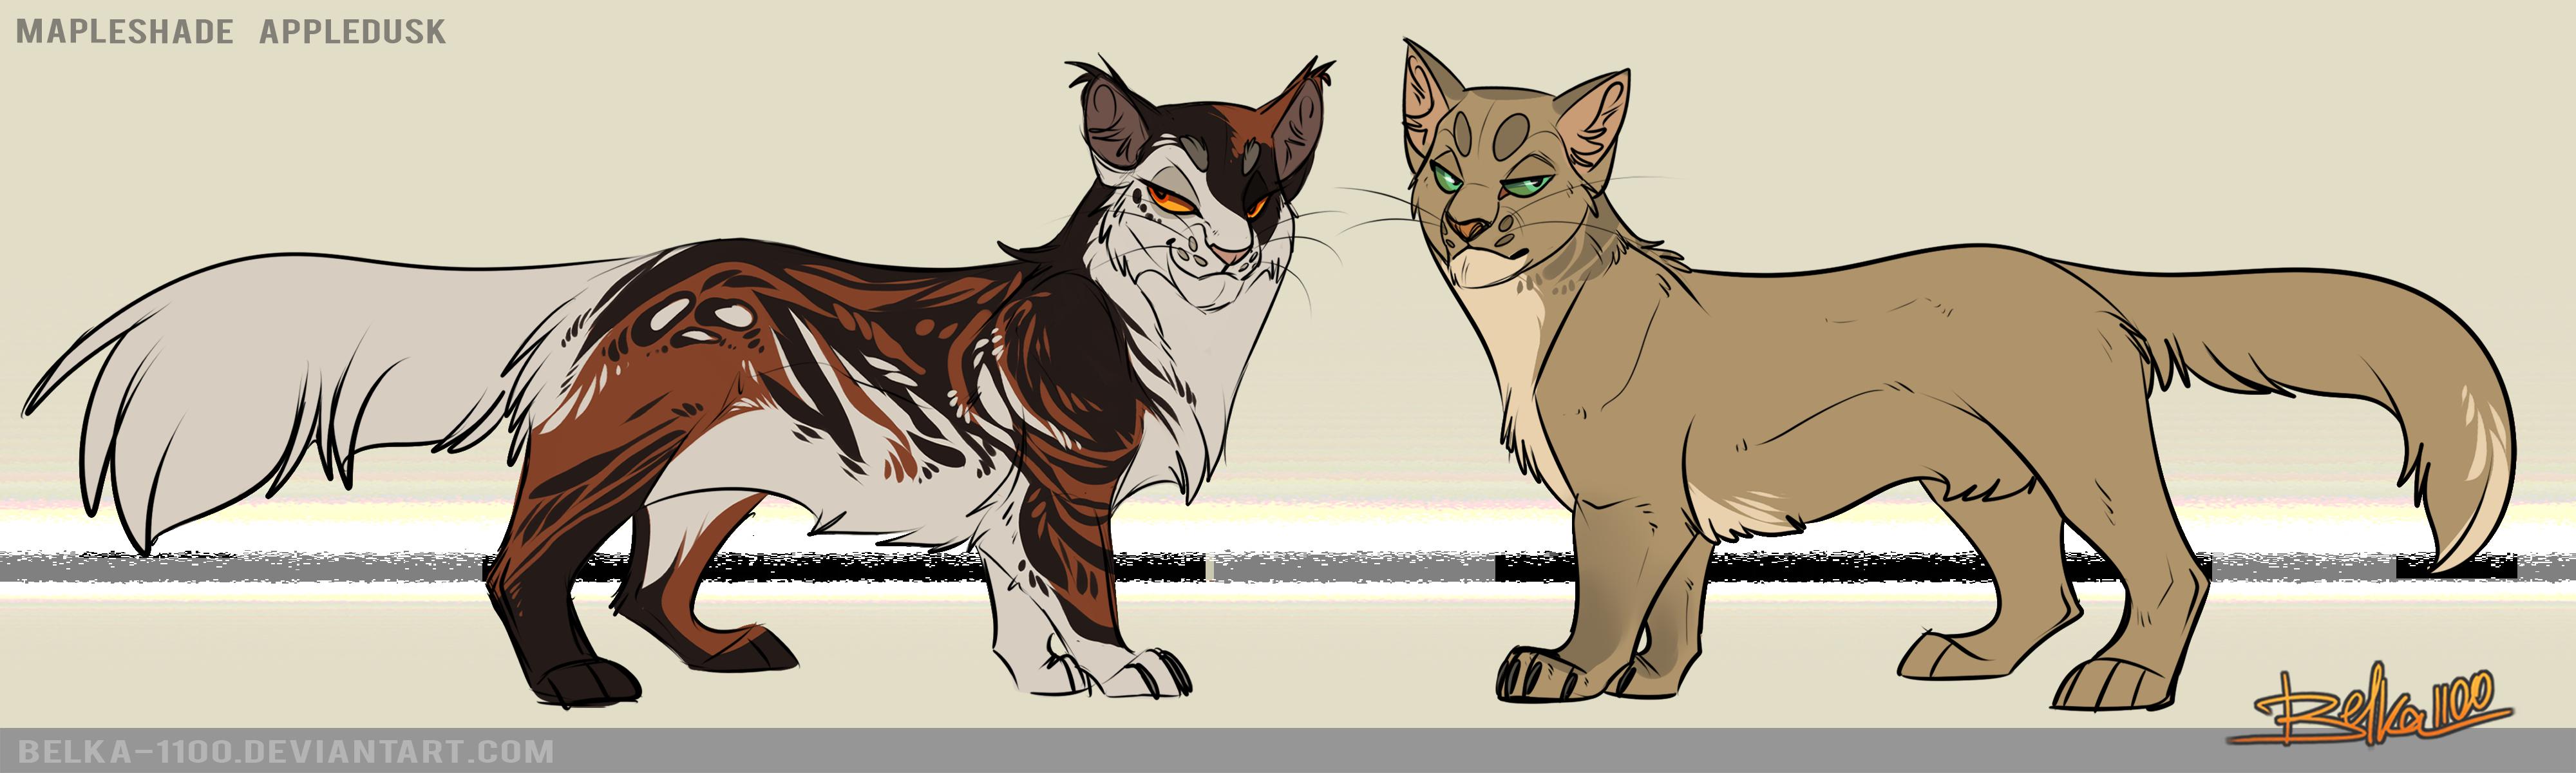 Warrior cats mapleshade and appledusk